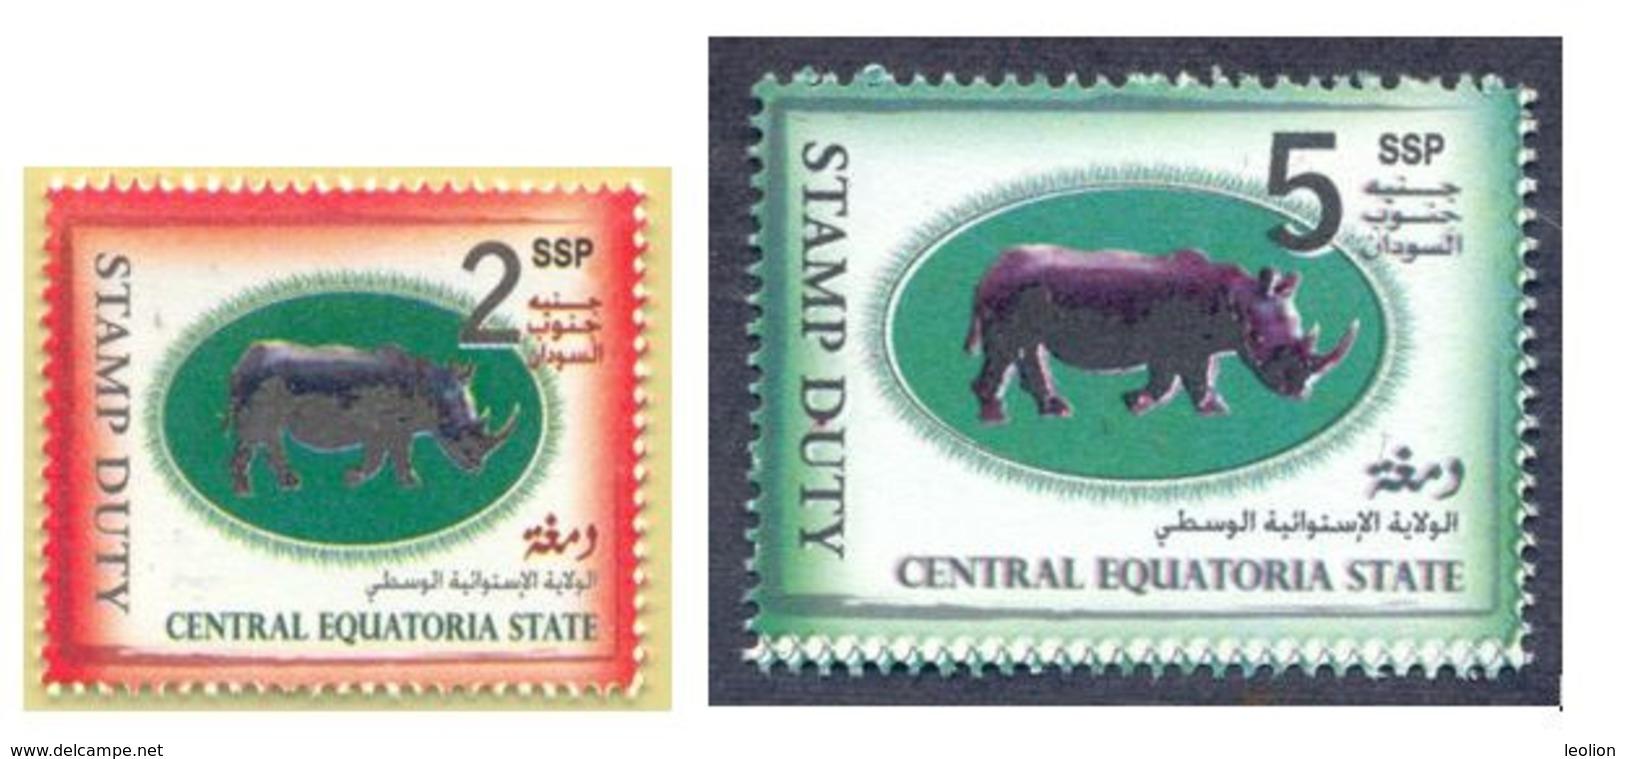 SOUTH SUDAN Short Set 2 & 5 SSP Revenue / Fiscal Stamp Central Equatoria State RHINO Timbres Fiscaux Soudan Du Sud RARE! - Zuid-Soedan